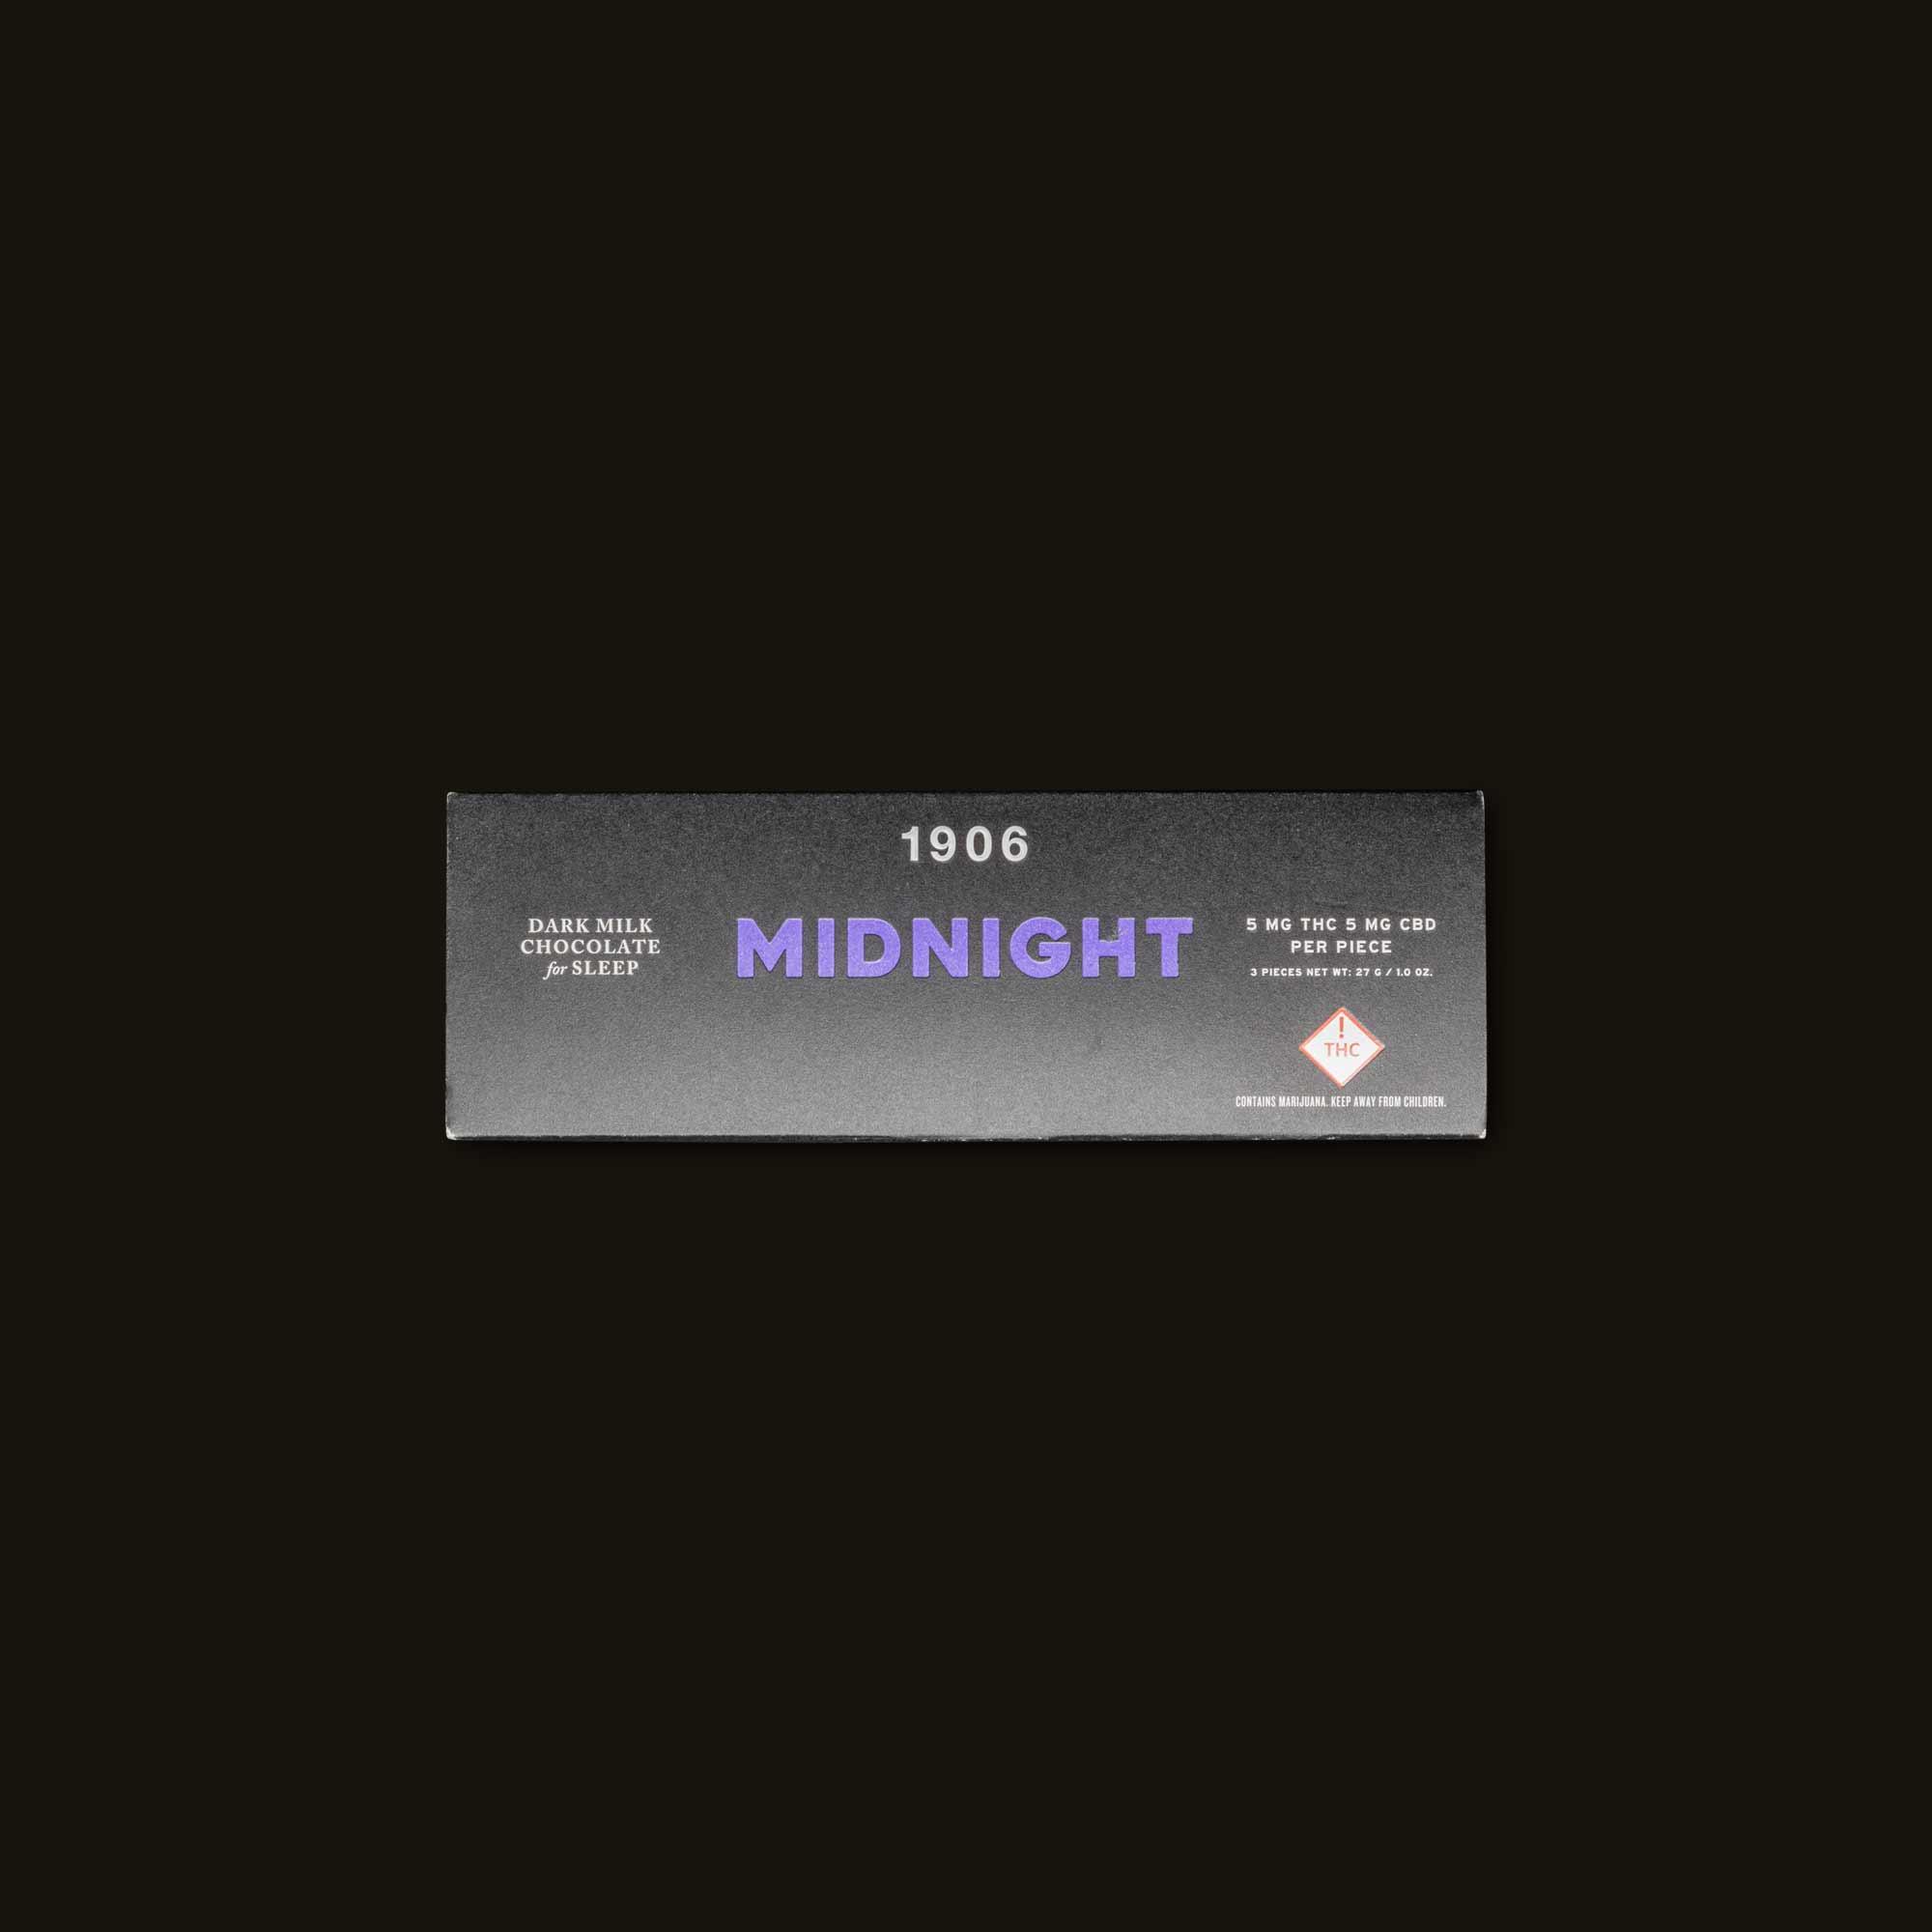 Midnight - 3 chocolates (15mg THC, 15mg CBD)